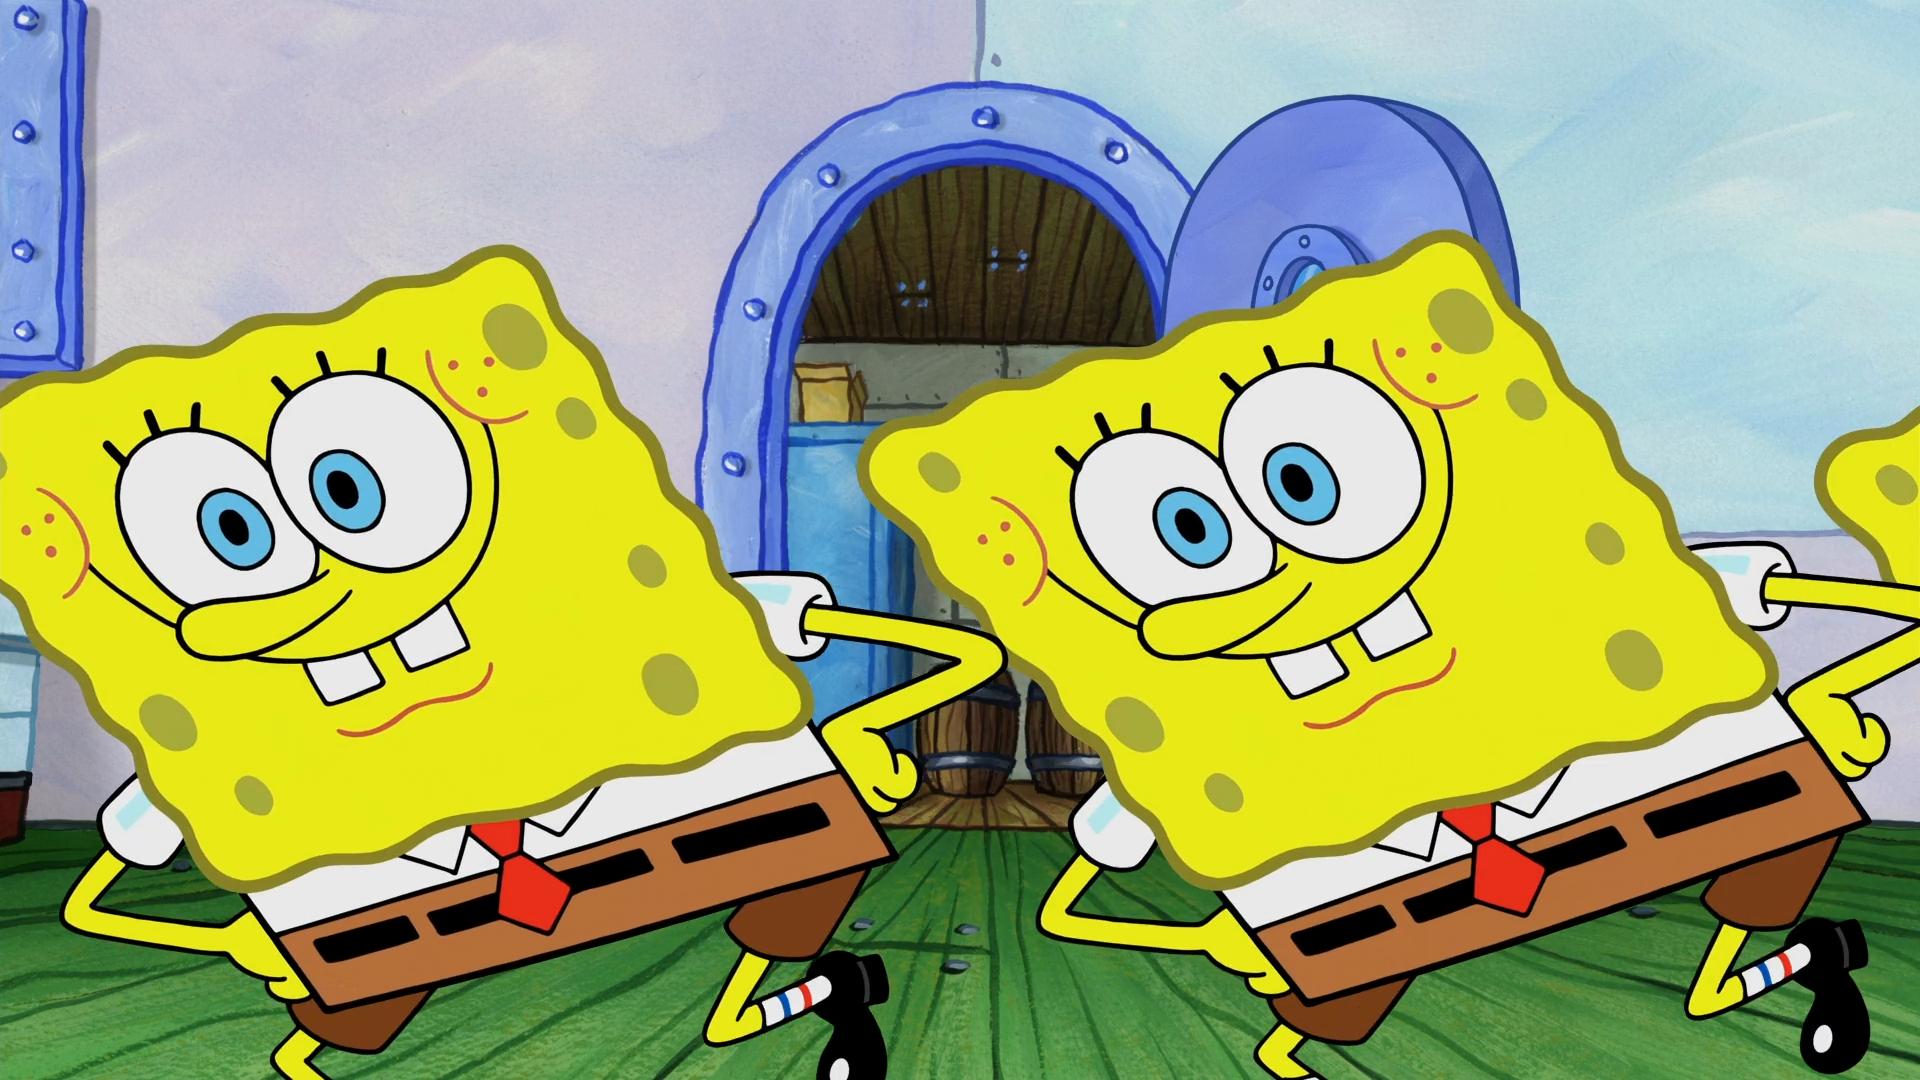 SpongeBob's slices